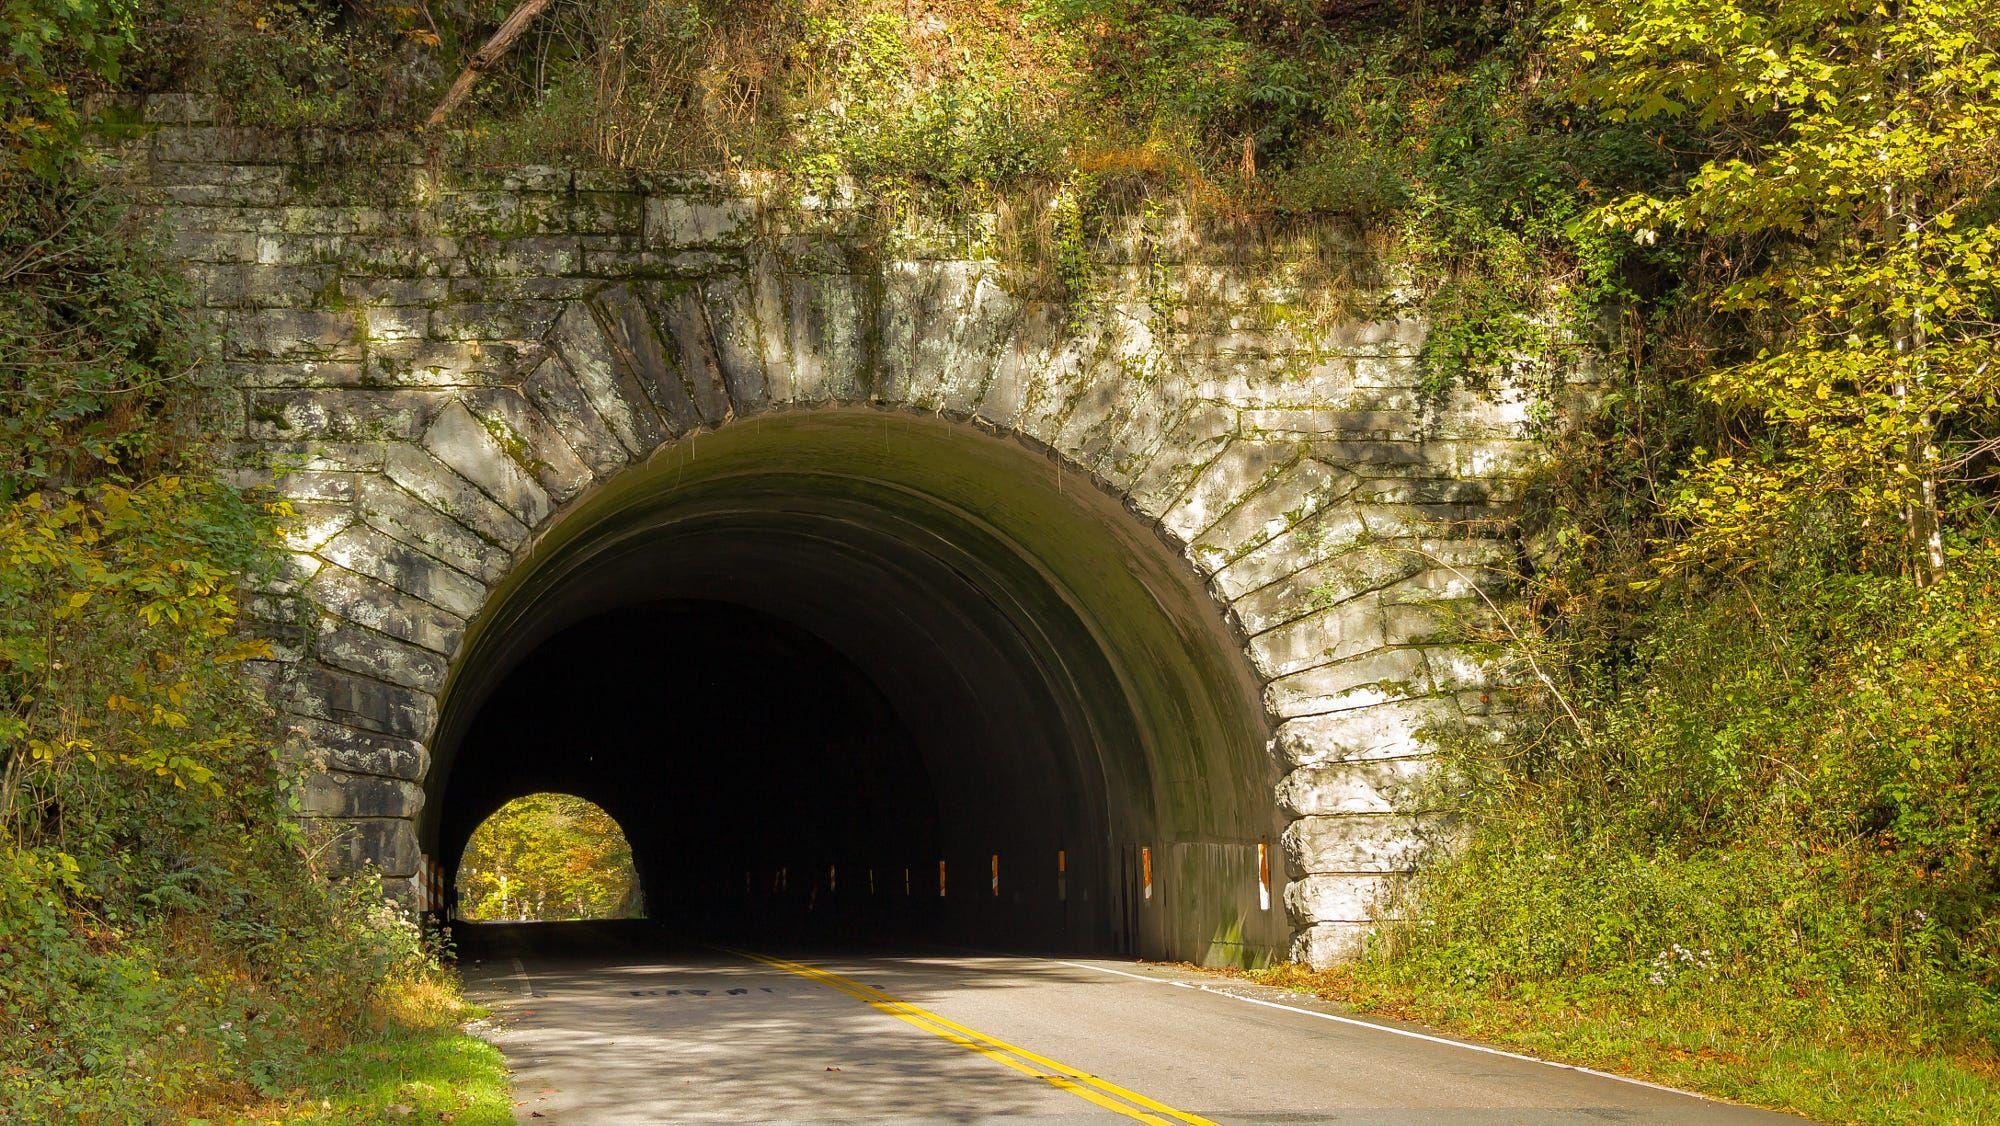 Little Switerland Tunnel on the Blue Ridge Parkway in North Carolina ...